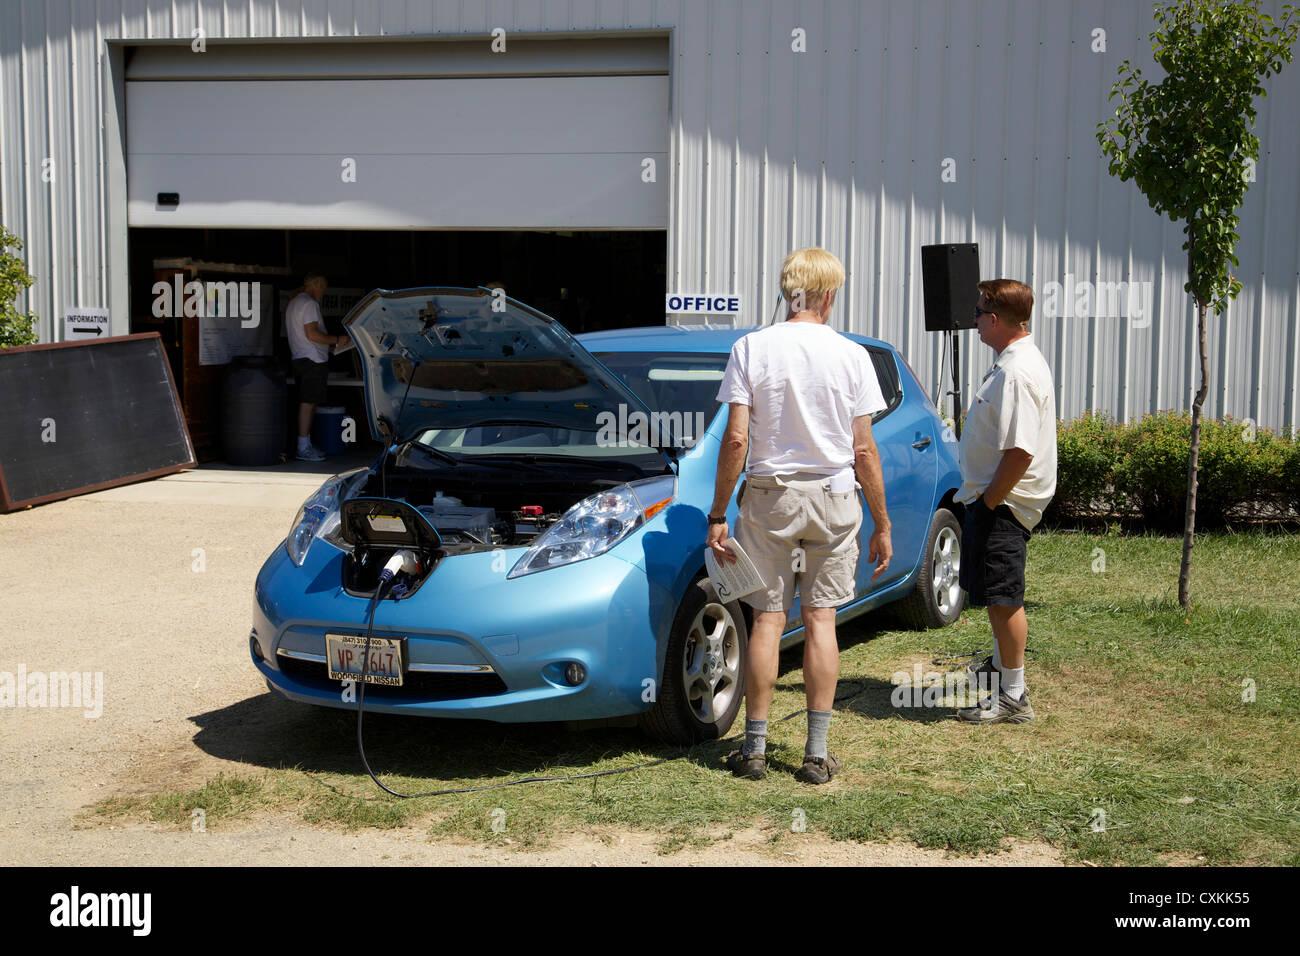 Nissan Leaf recharging. Renewable energy fair, Oregon, Illinois - Stock Image